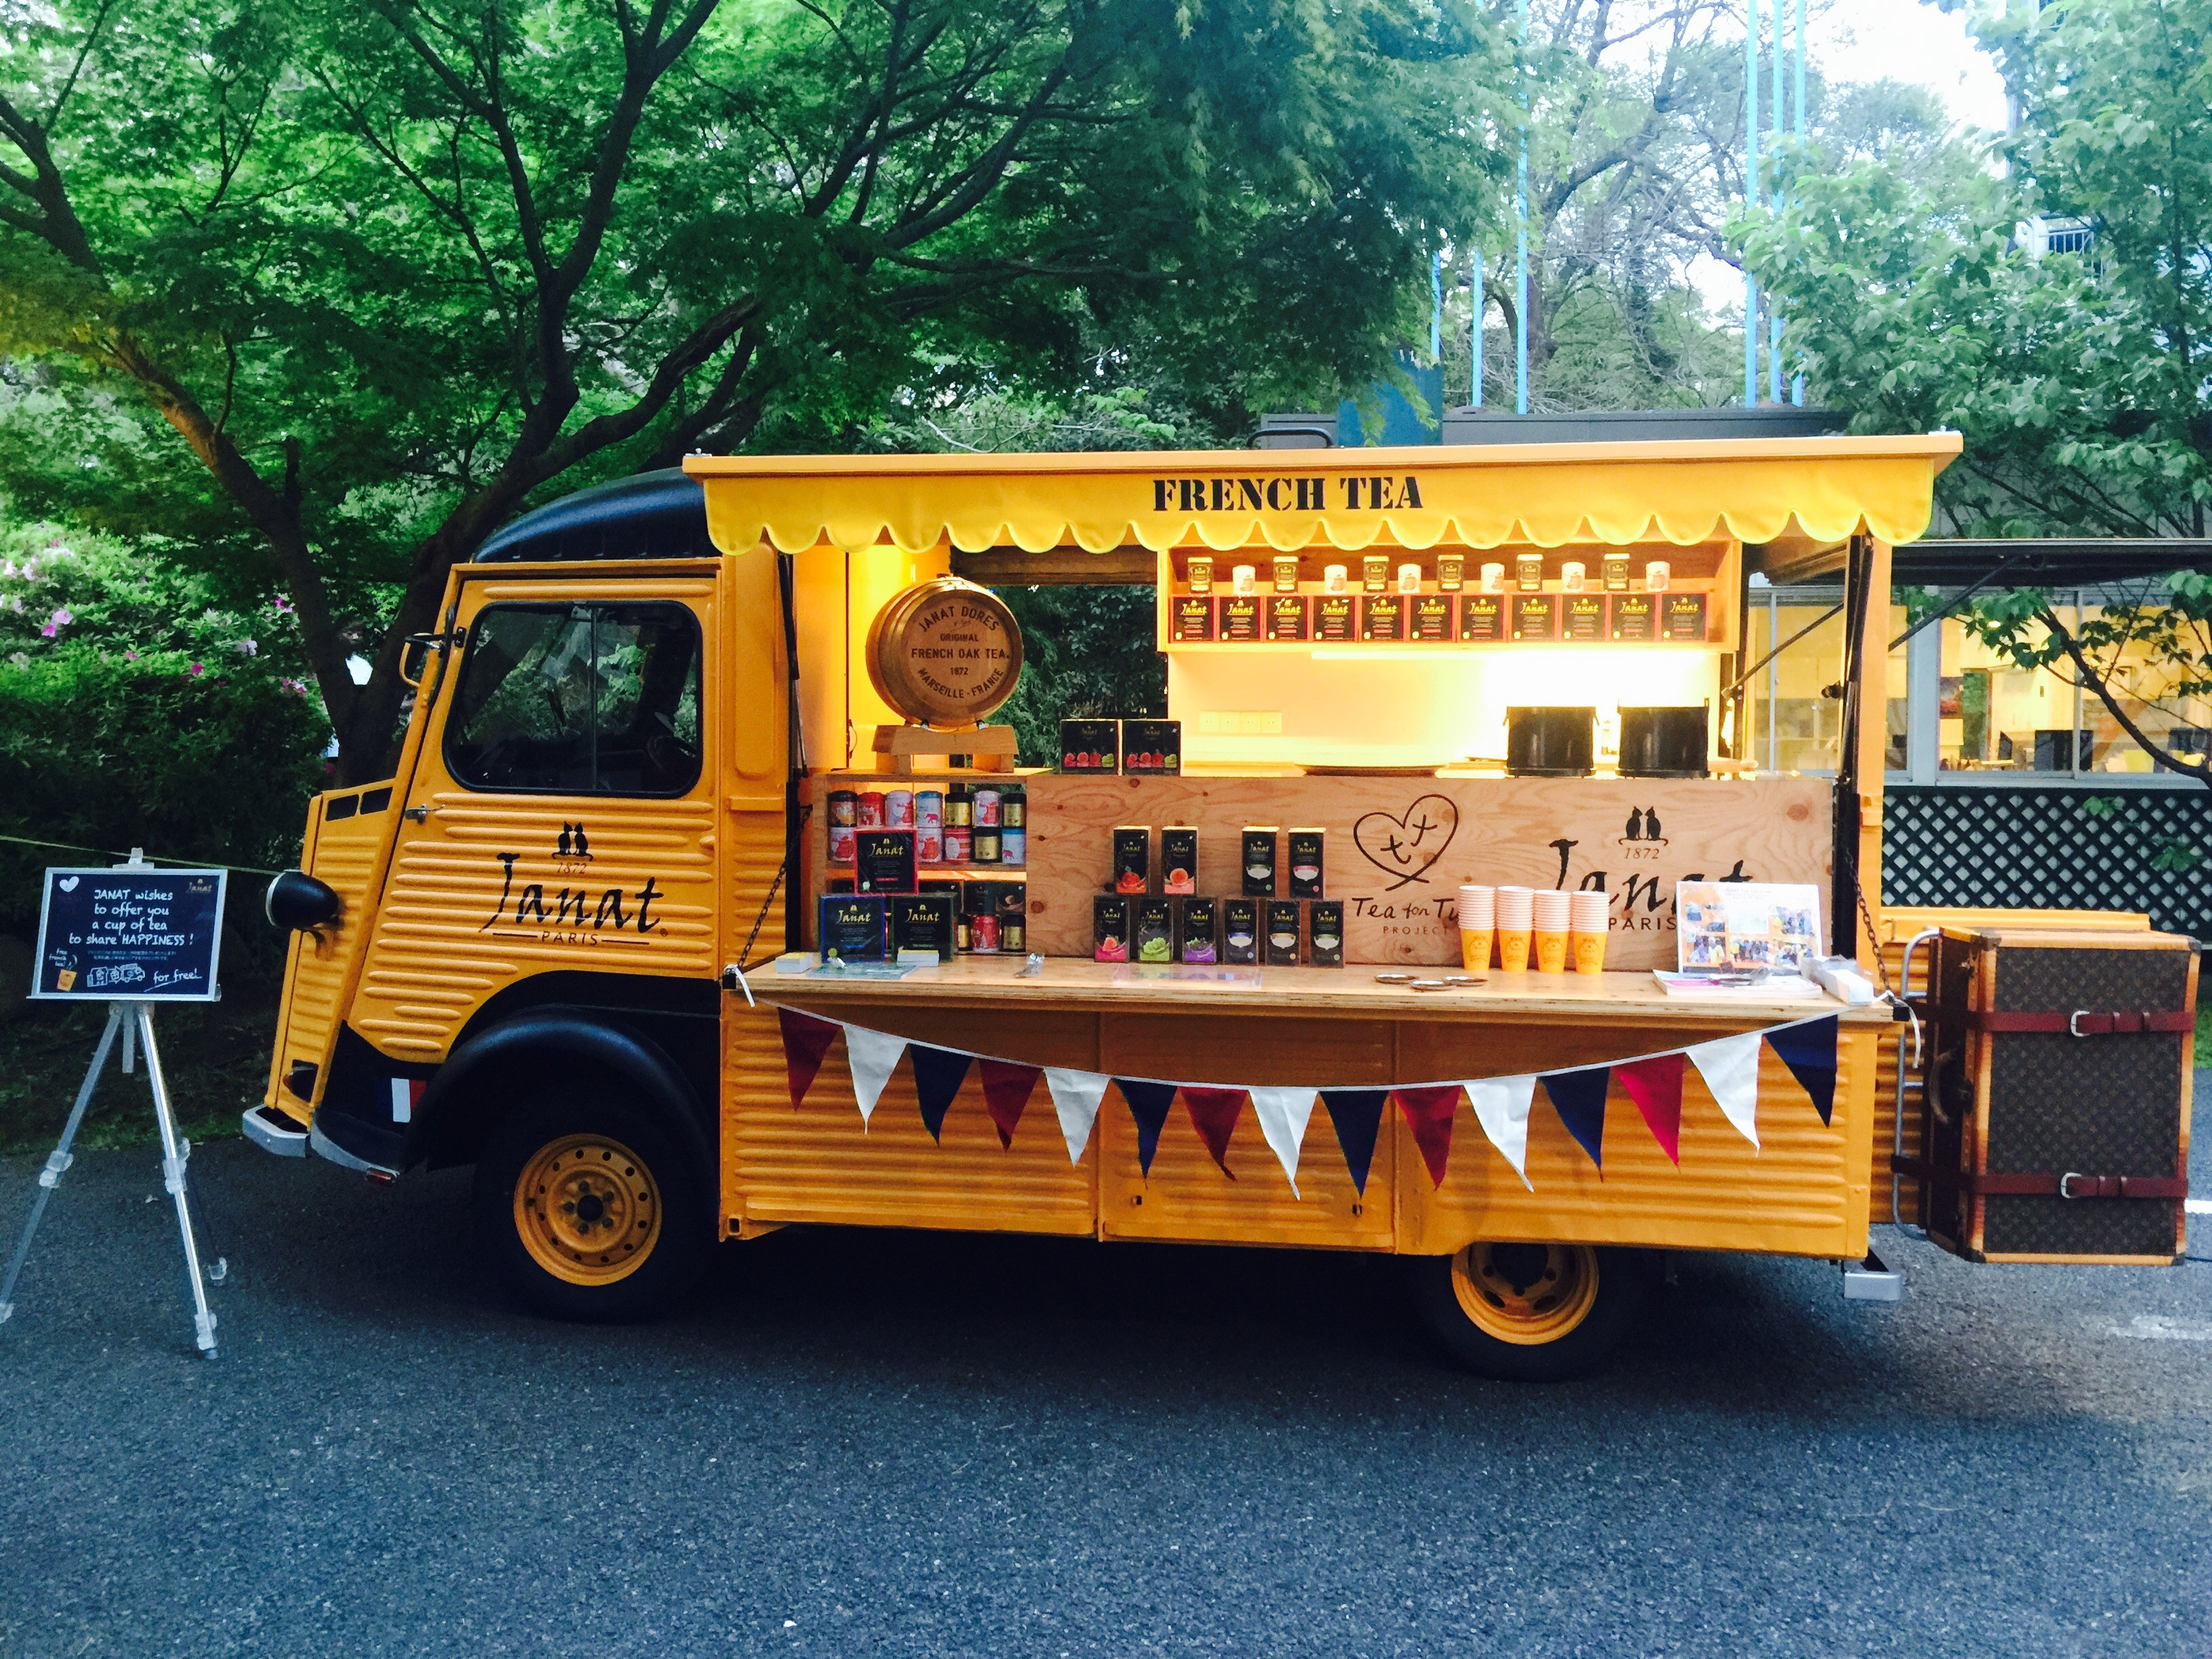 French Tea Caravan